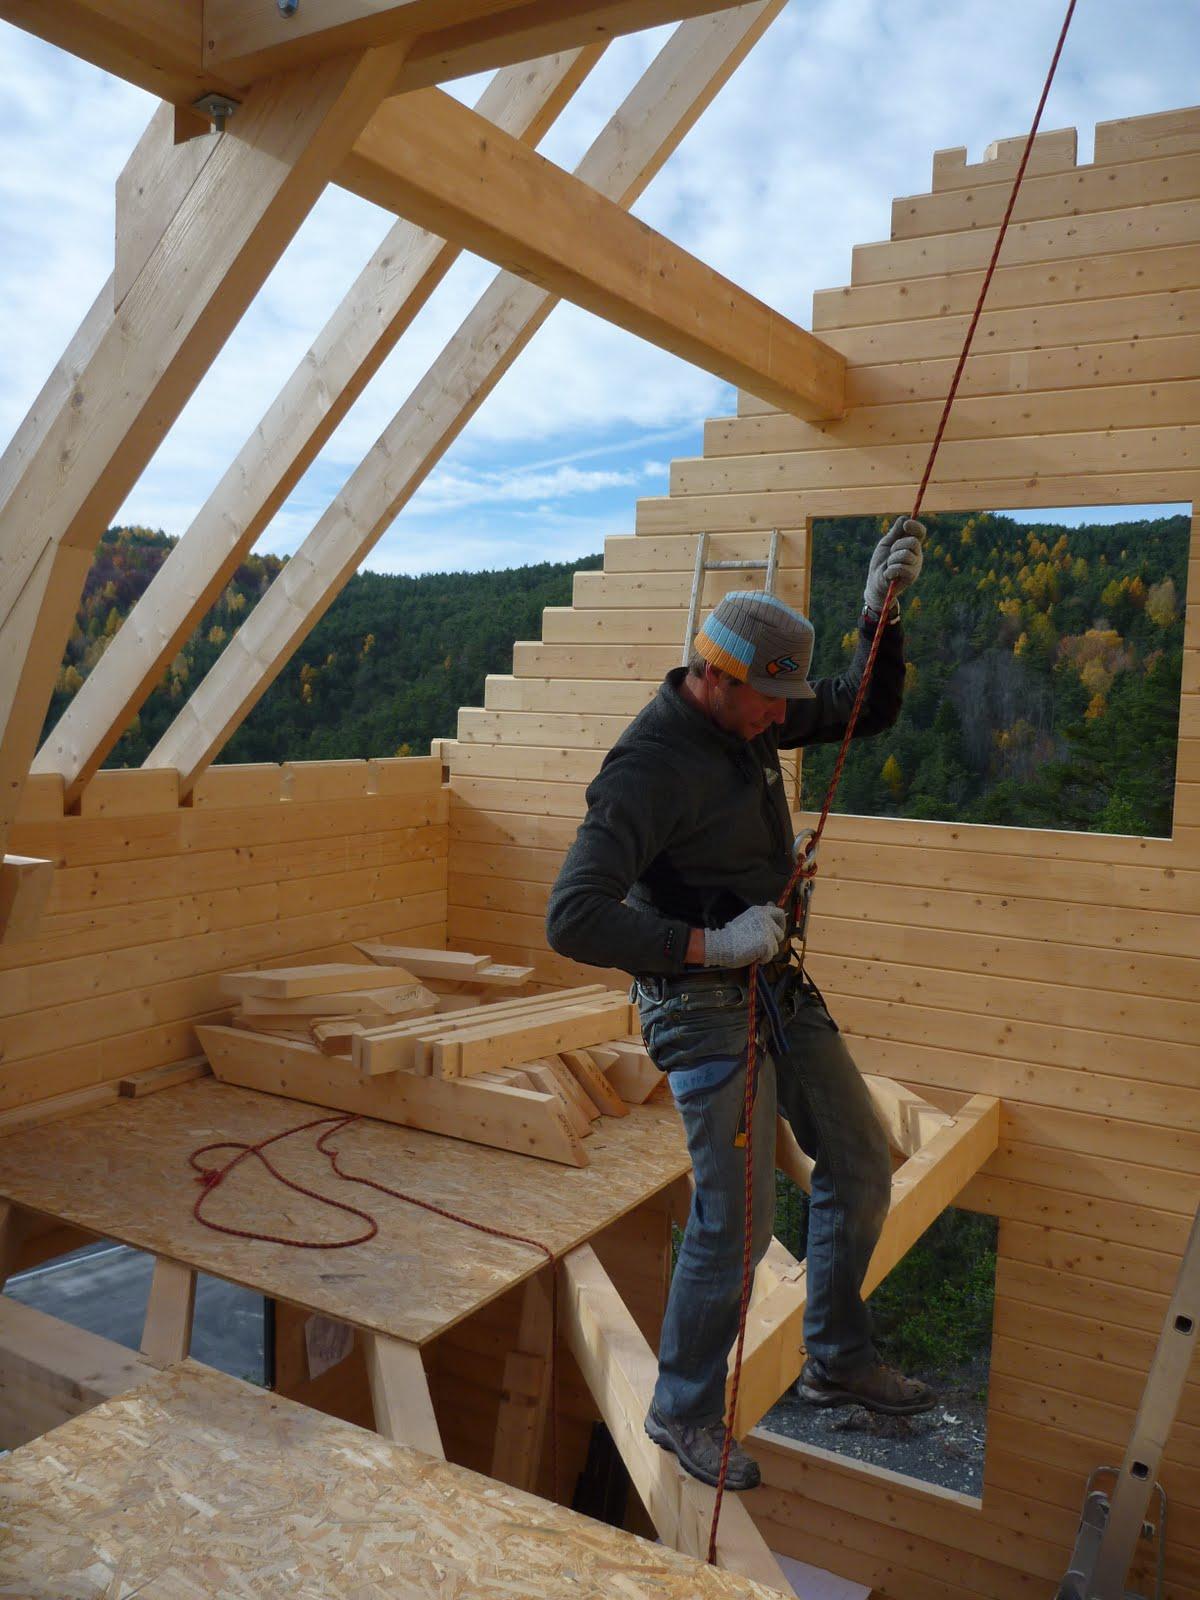 Construire sa maison 3 novembre on commence monter la for Monter sa maison